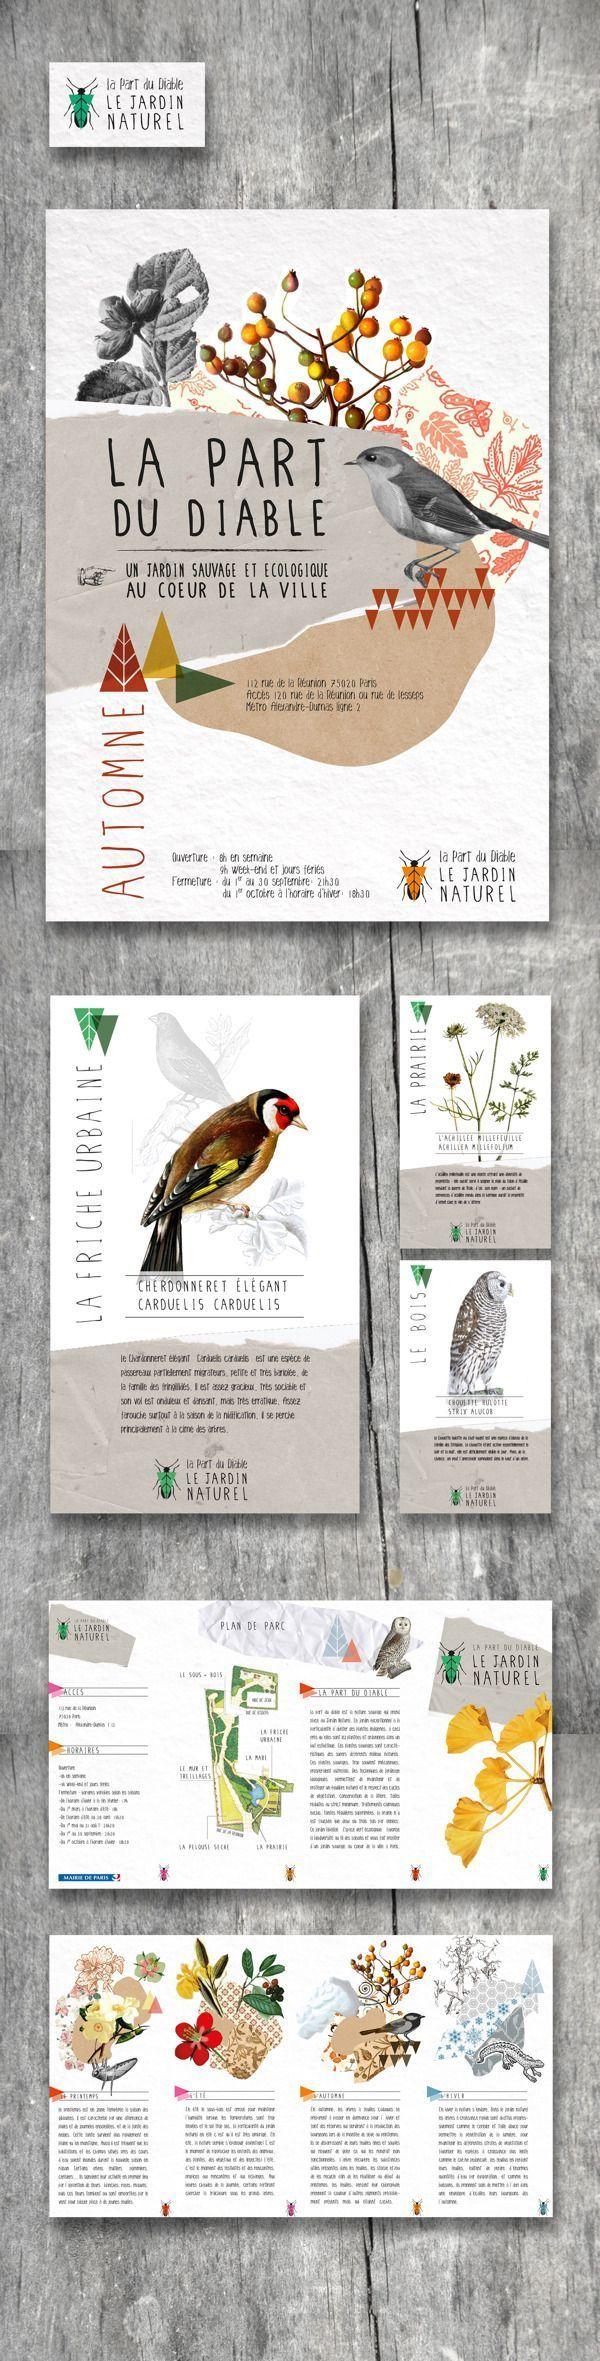 Brochure - Liên hệ HOTLINE: 0936 846 943